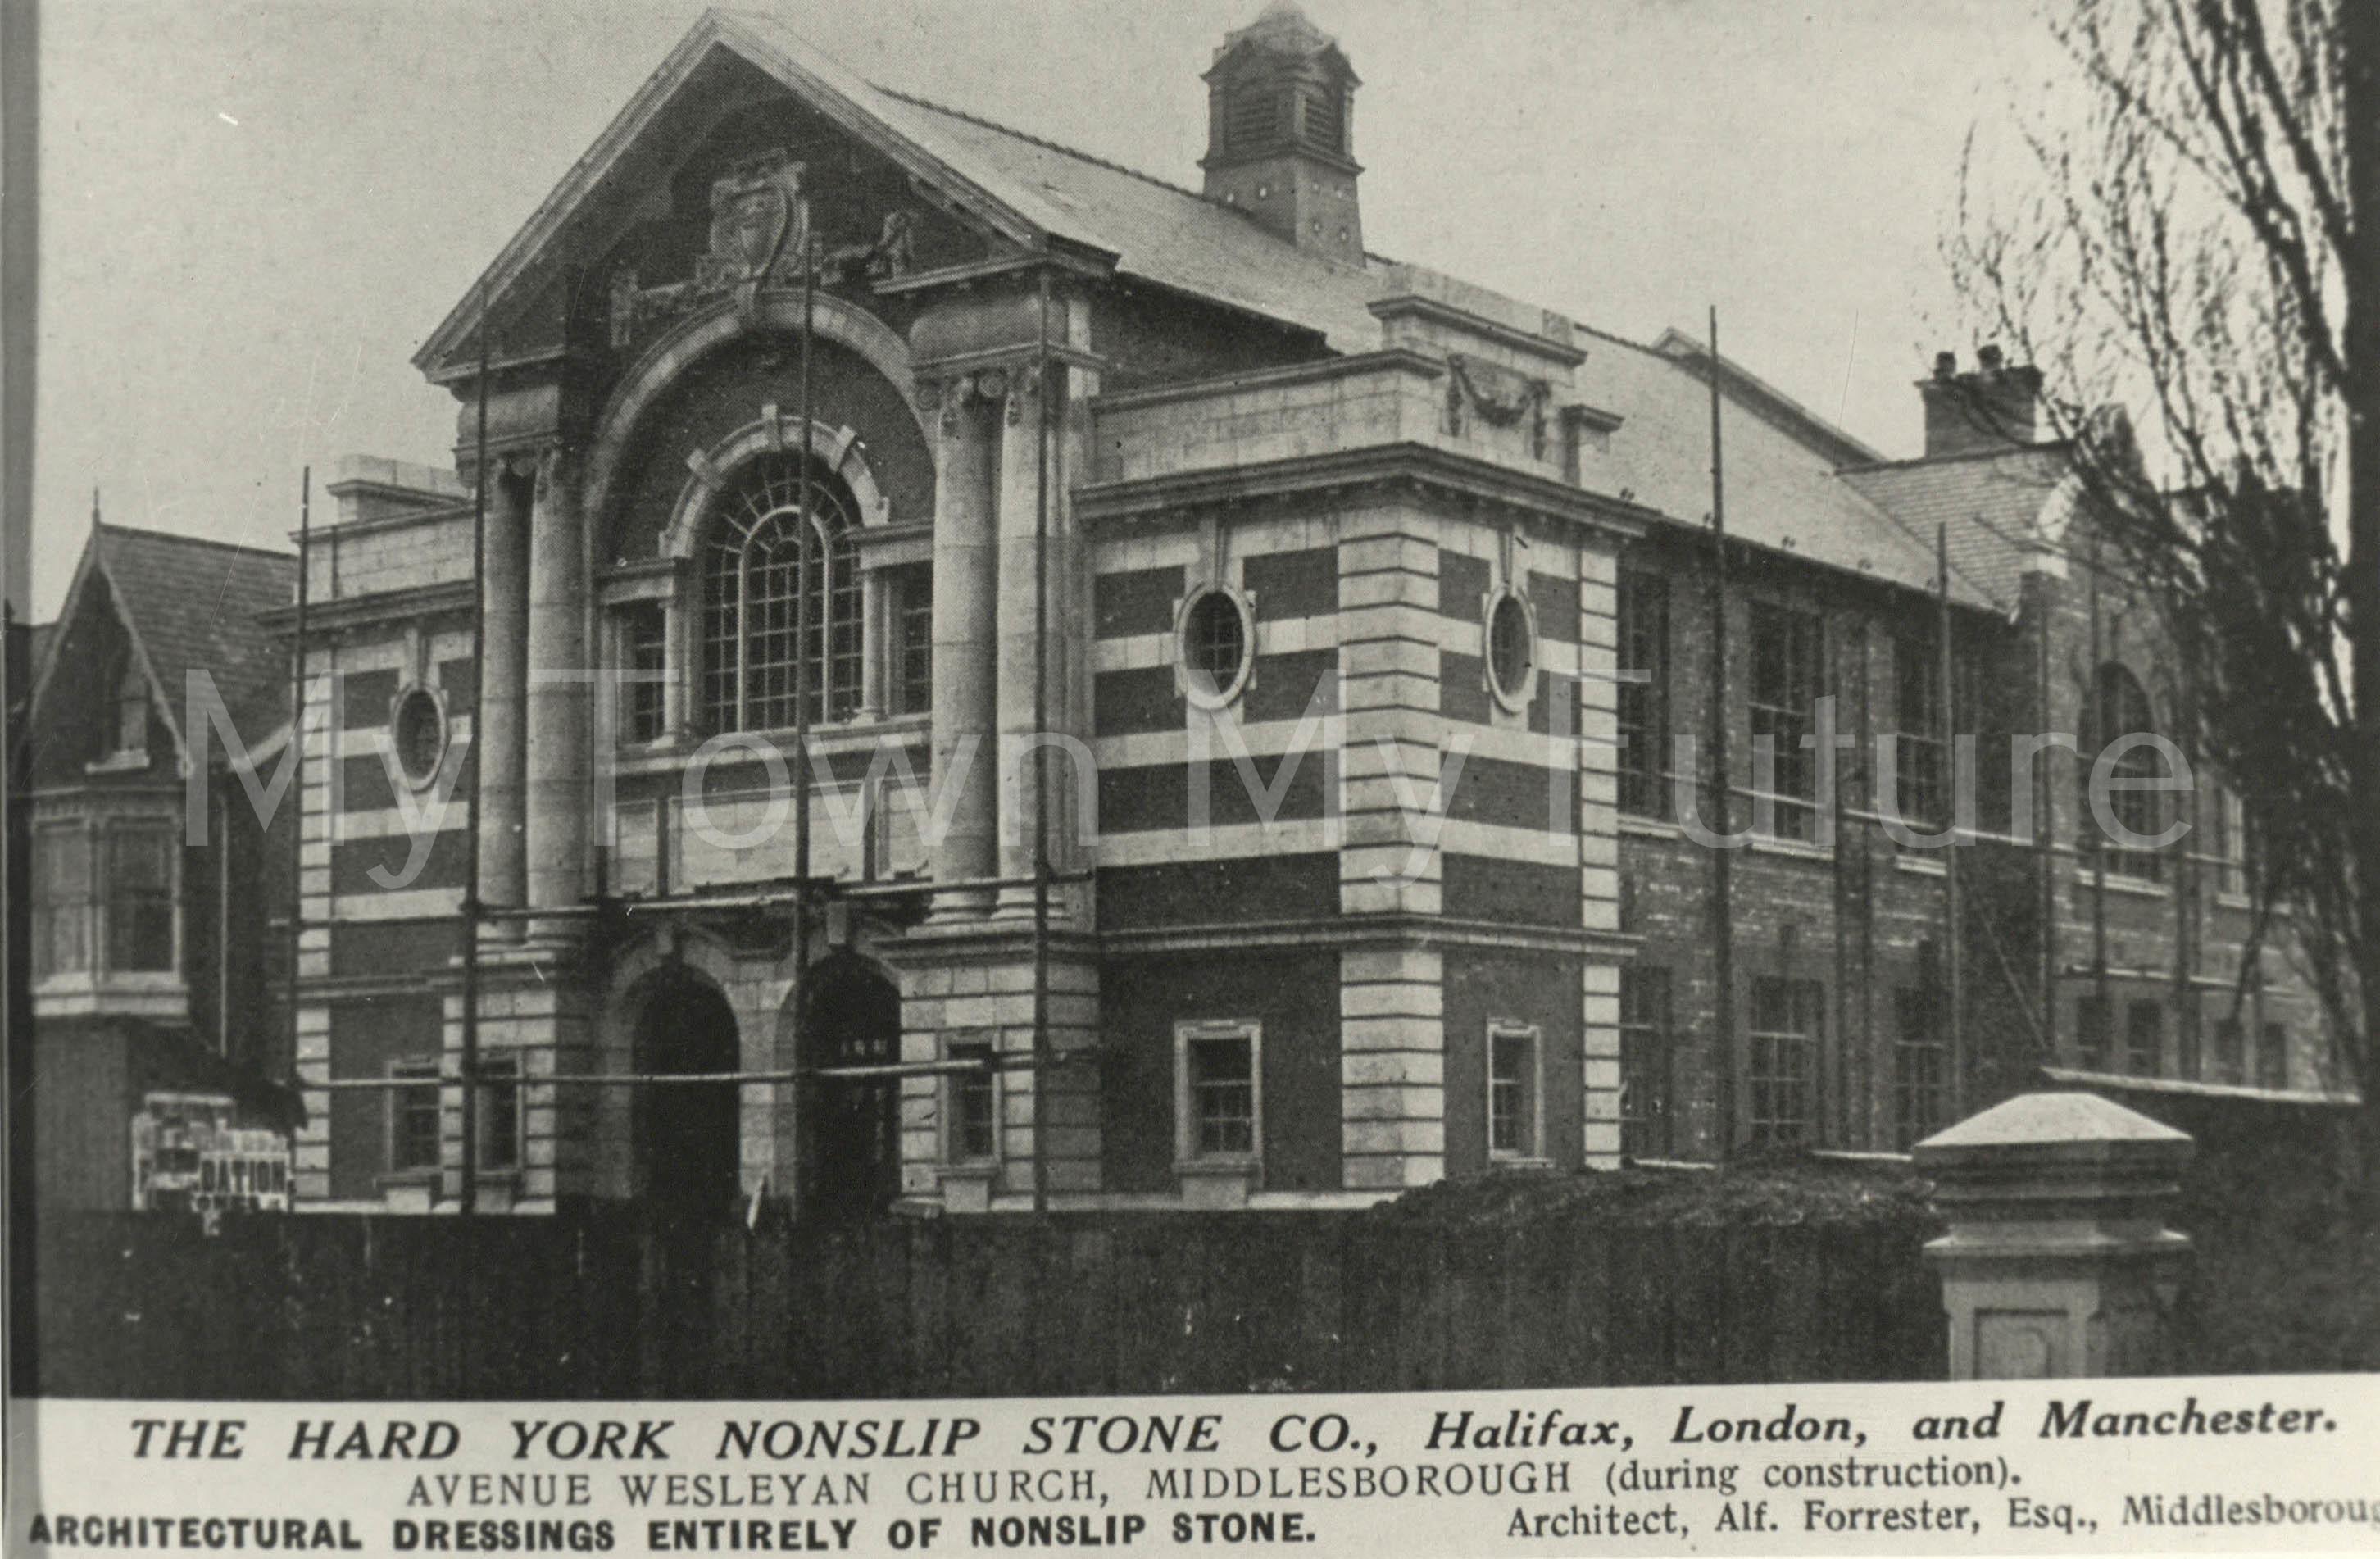 The Avenue Wesleyan Church.